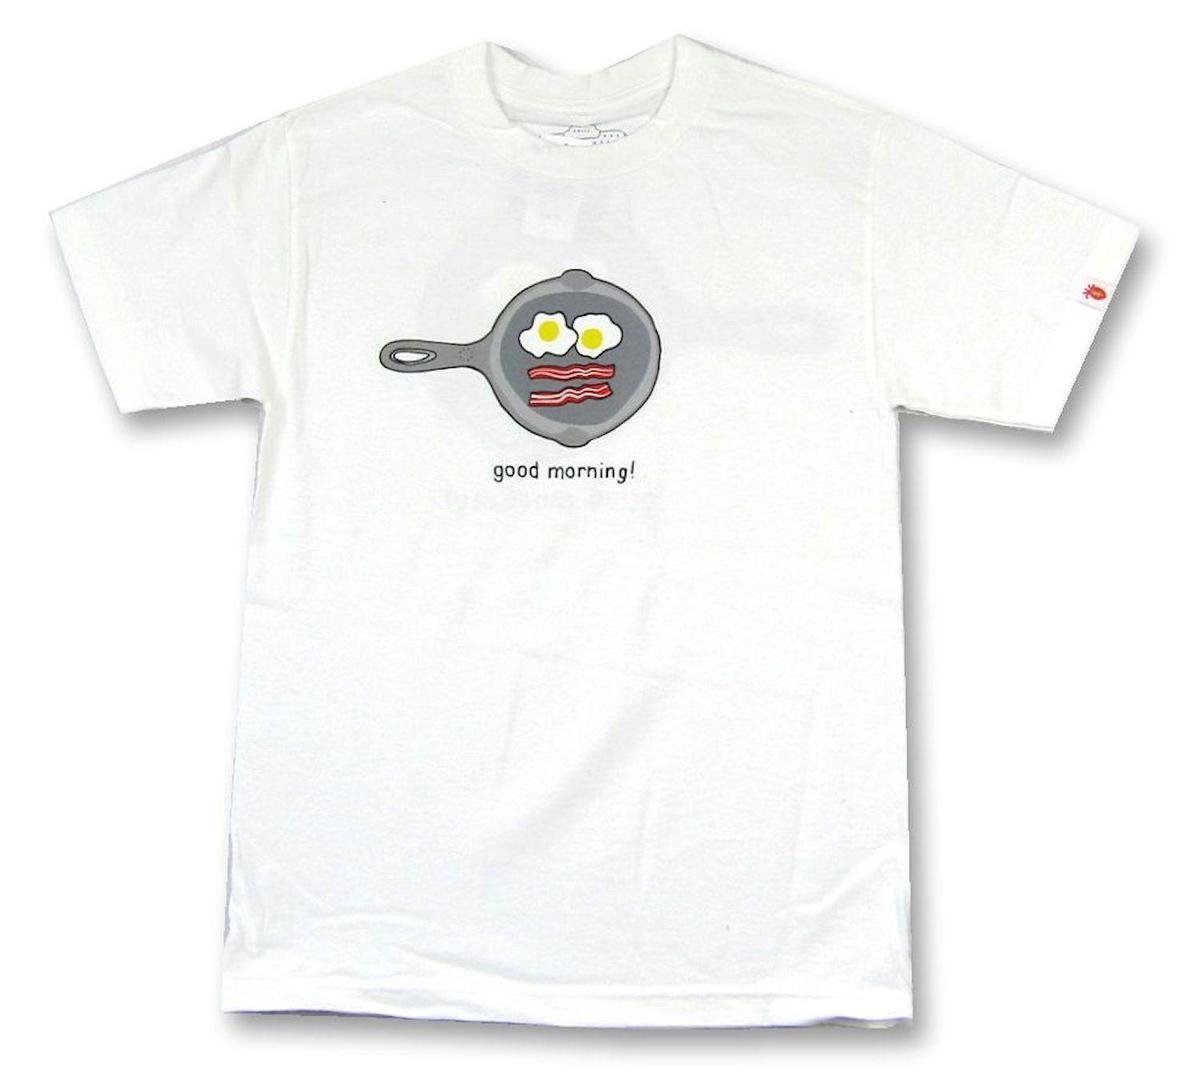 1df0438ef Mac Miller Good Morning Wakey Wakey White T Shirt New Official Merch GO:OD  AM Humorous Shirts Buy Tee Shirts From Linnan00010, $14.67| DHgate.Com